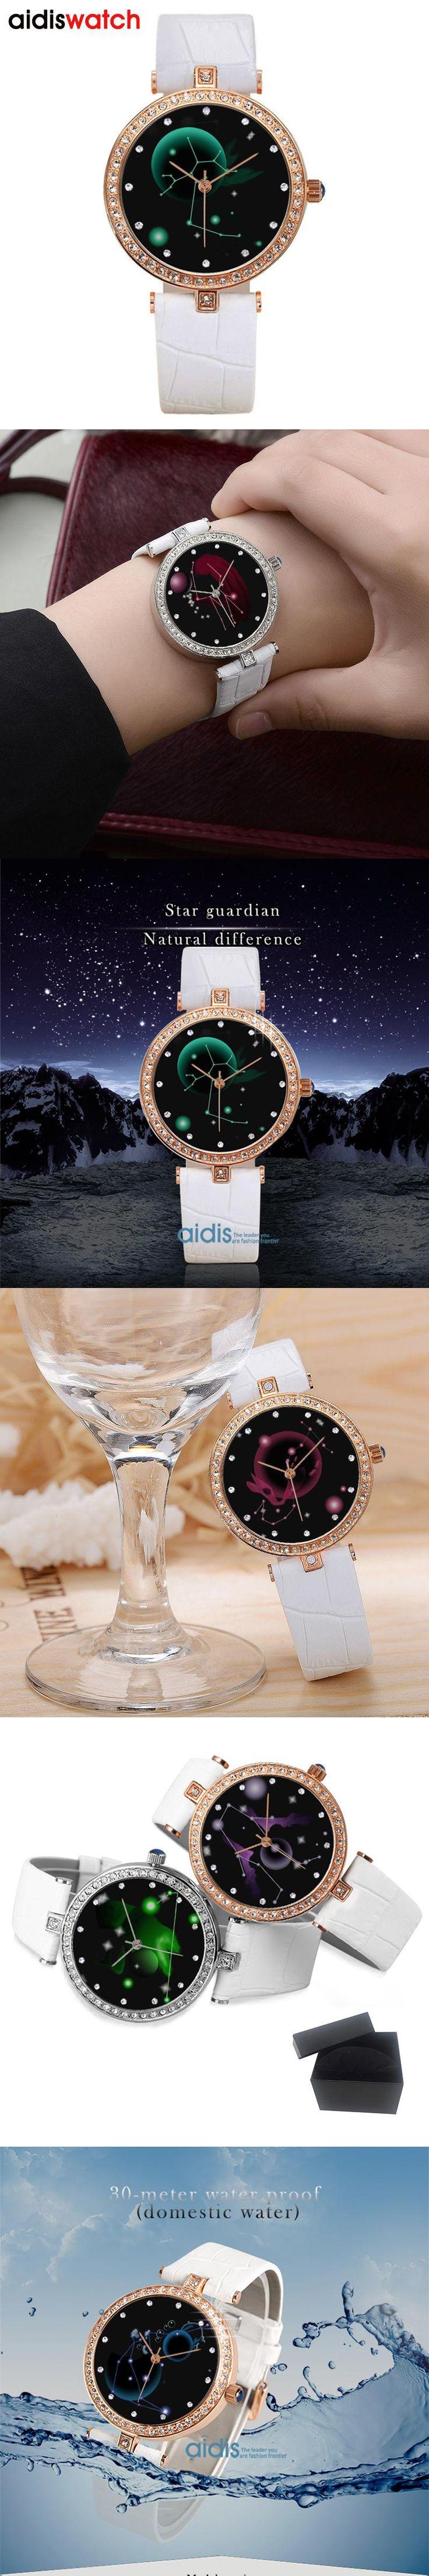 Hot sale Lady  Watch Women Leather Quartz Watches Brand Luxury Popular Watch Women Casual Fashion Wristwatches 2016 New Style